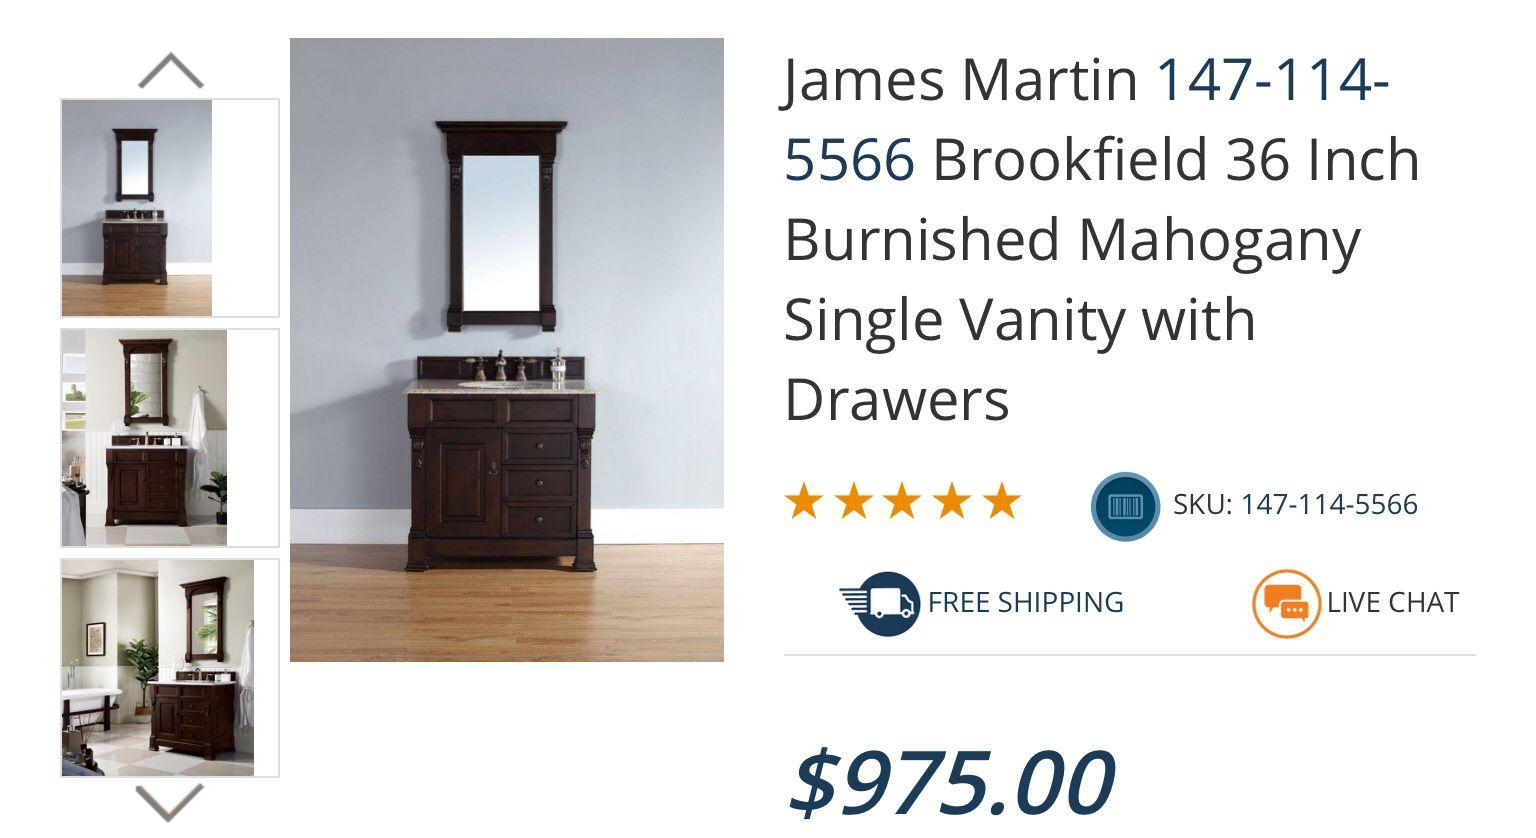 James Martin 147-114-5566 Brookfield 36 Inch Burnished Mahogany Single Vanity with Top